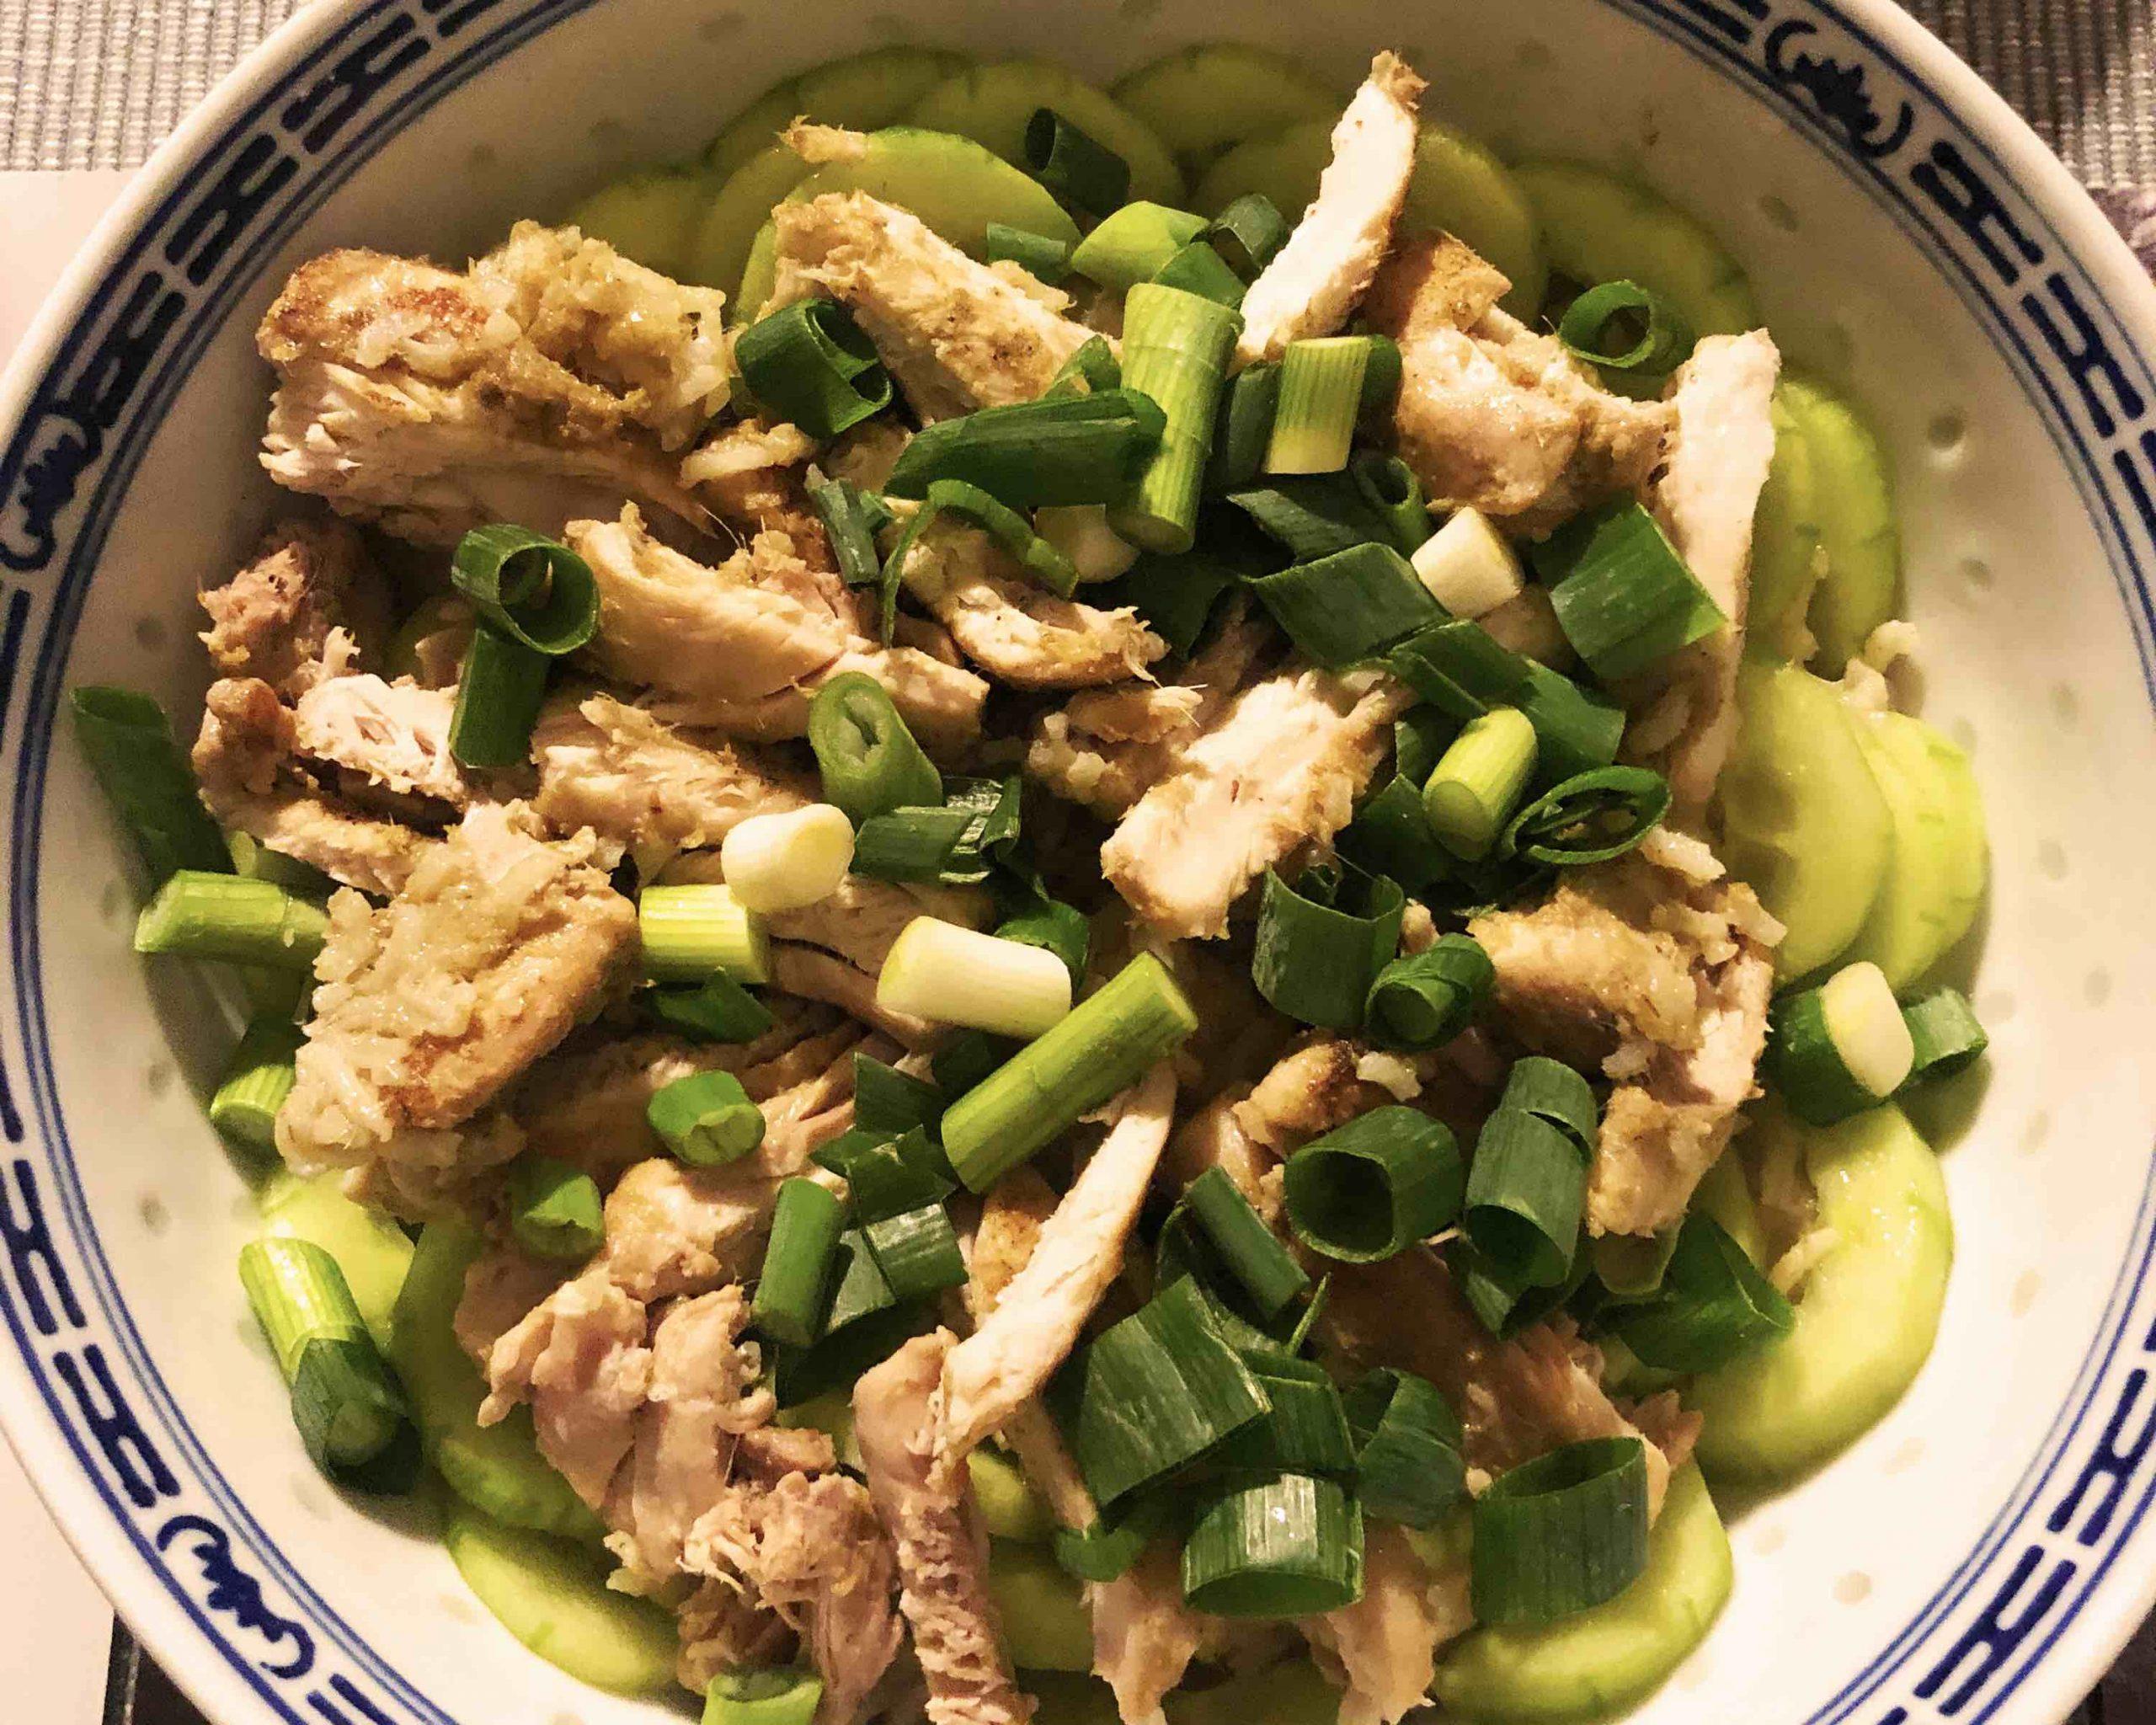 Hainanese Chicken Rice, Hainanese Chicken Rice